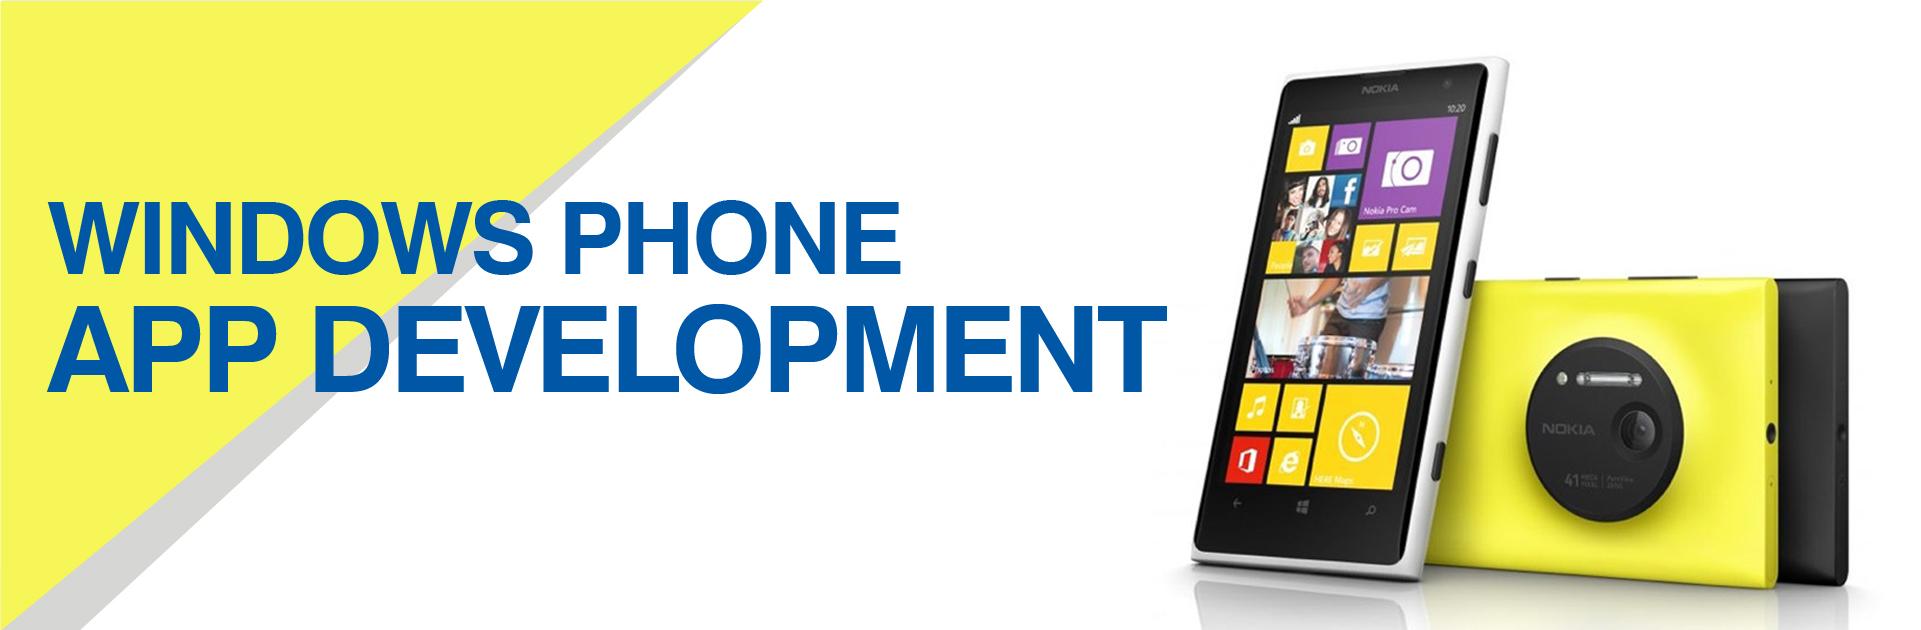 windows phone app development Company